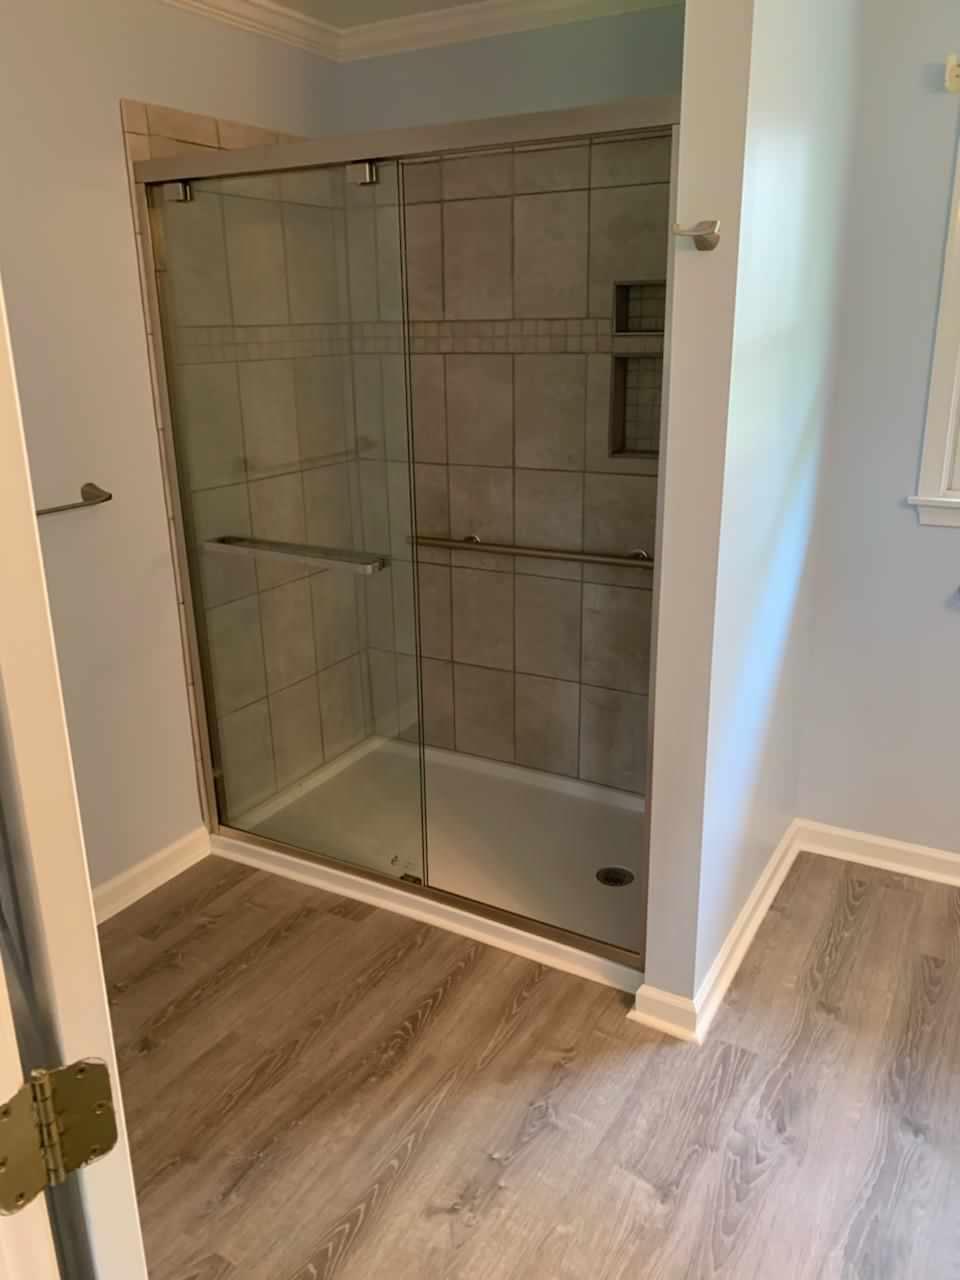 Bear Bathroom Remodel